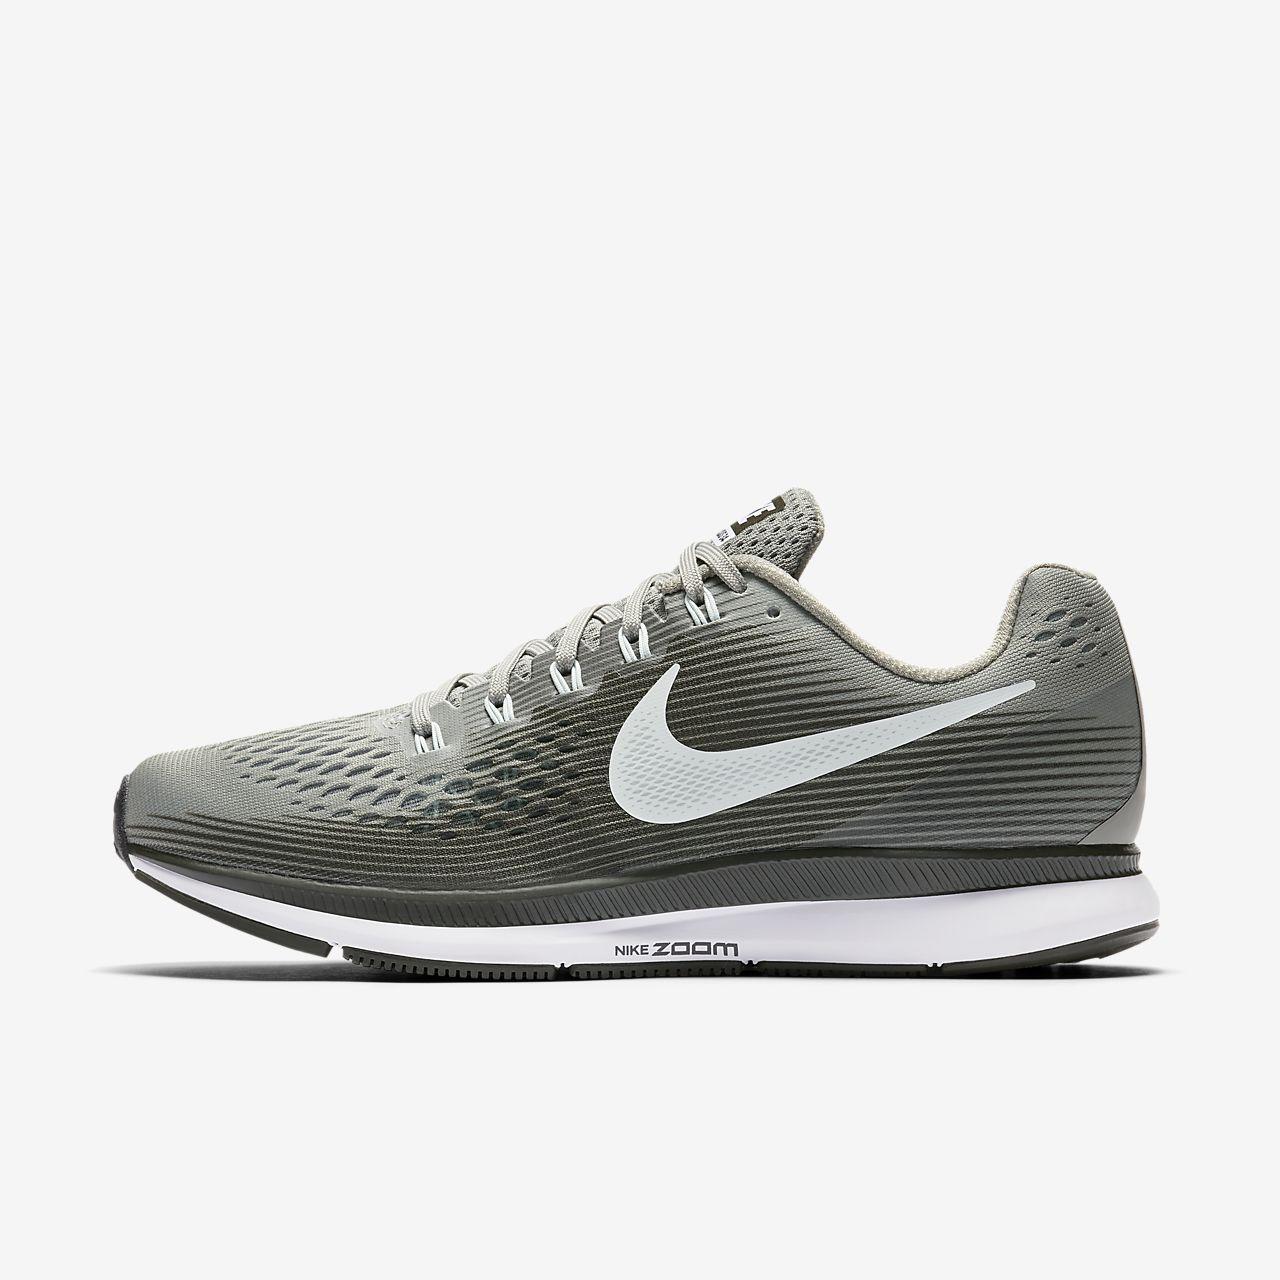 Nike Chaussures de Running Air Zoom Pegasus 34 BleuNoirJaune Fluo Enfant